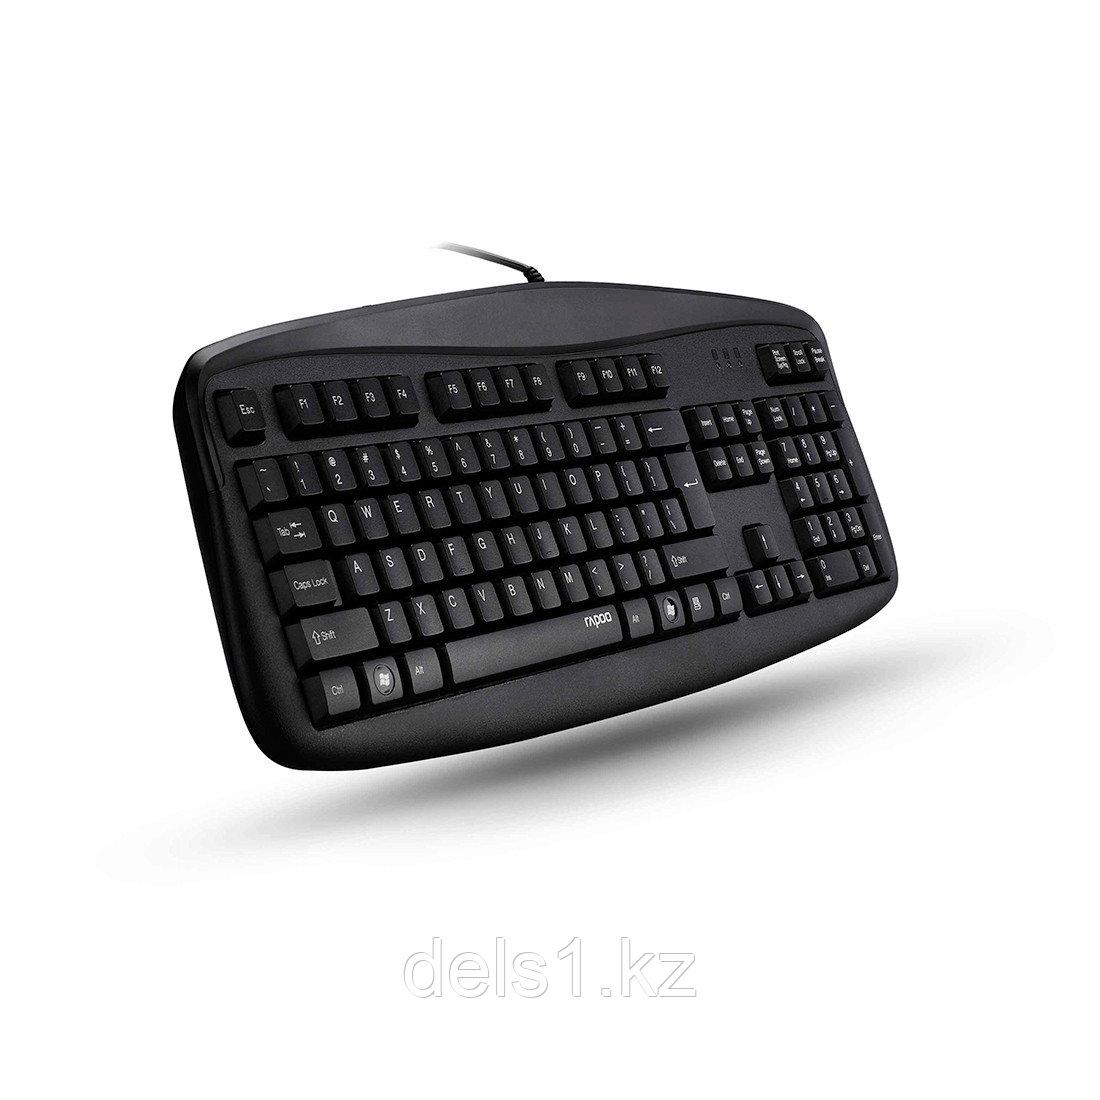 Клавиатура, Rapoo, NK2500, USB, Кол-во стандартных клавиш 104, Длина кабеля 1,45 метра, Анг/Рус/Каз, Чёрный